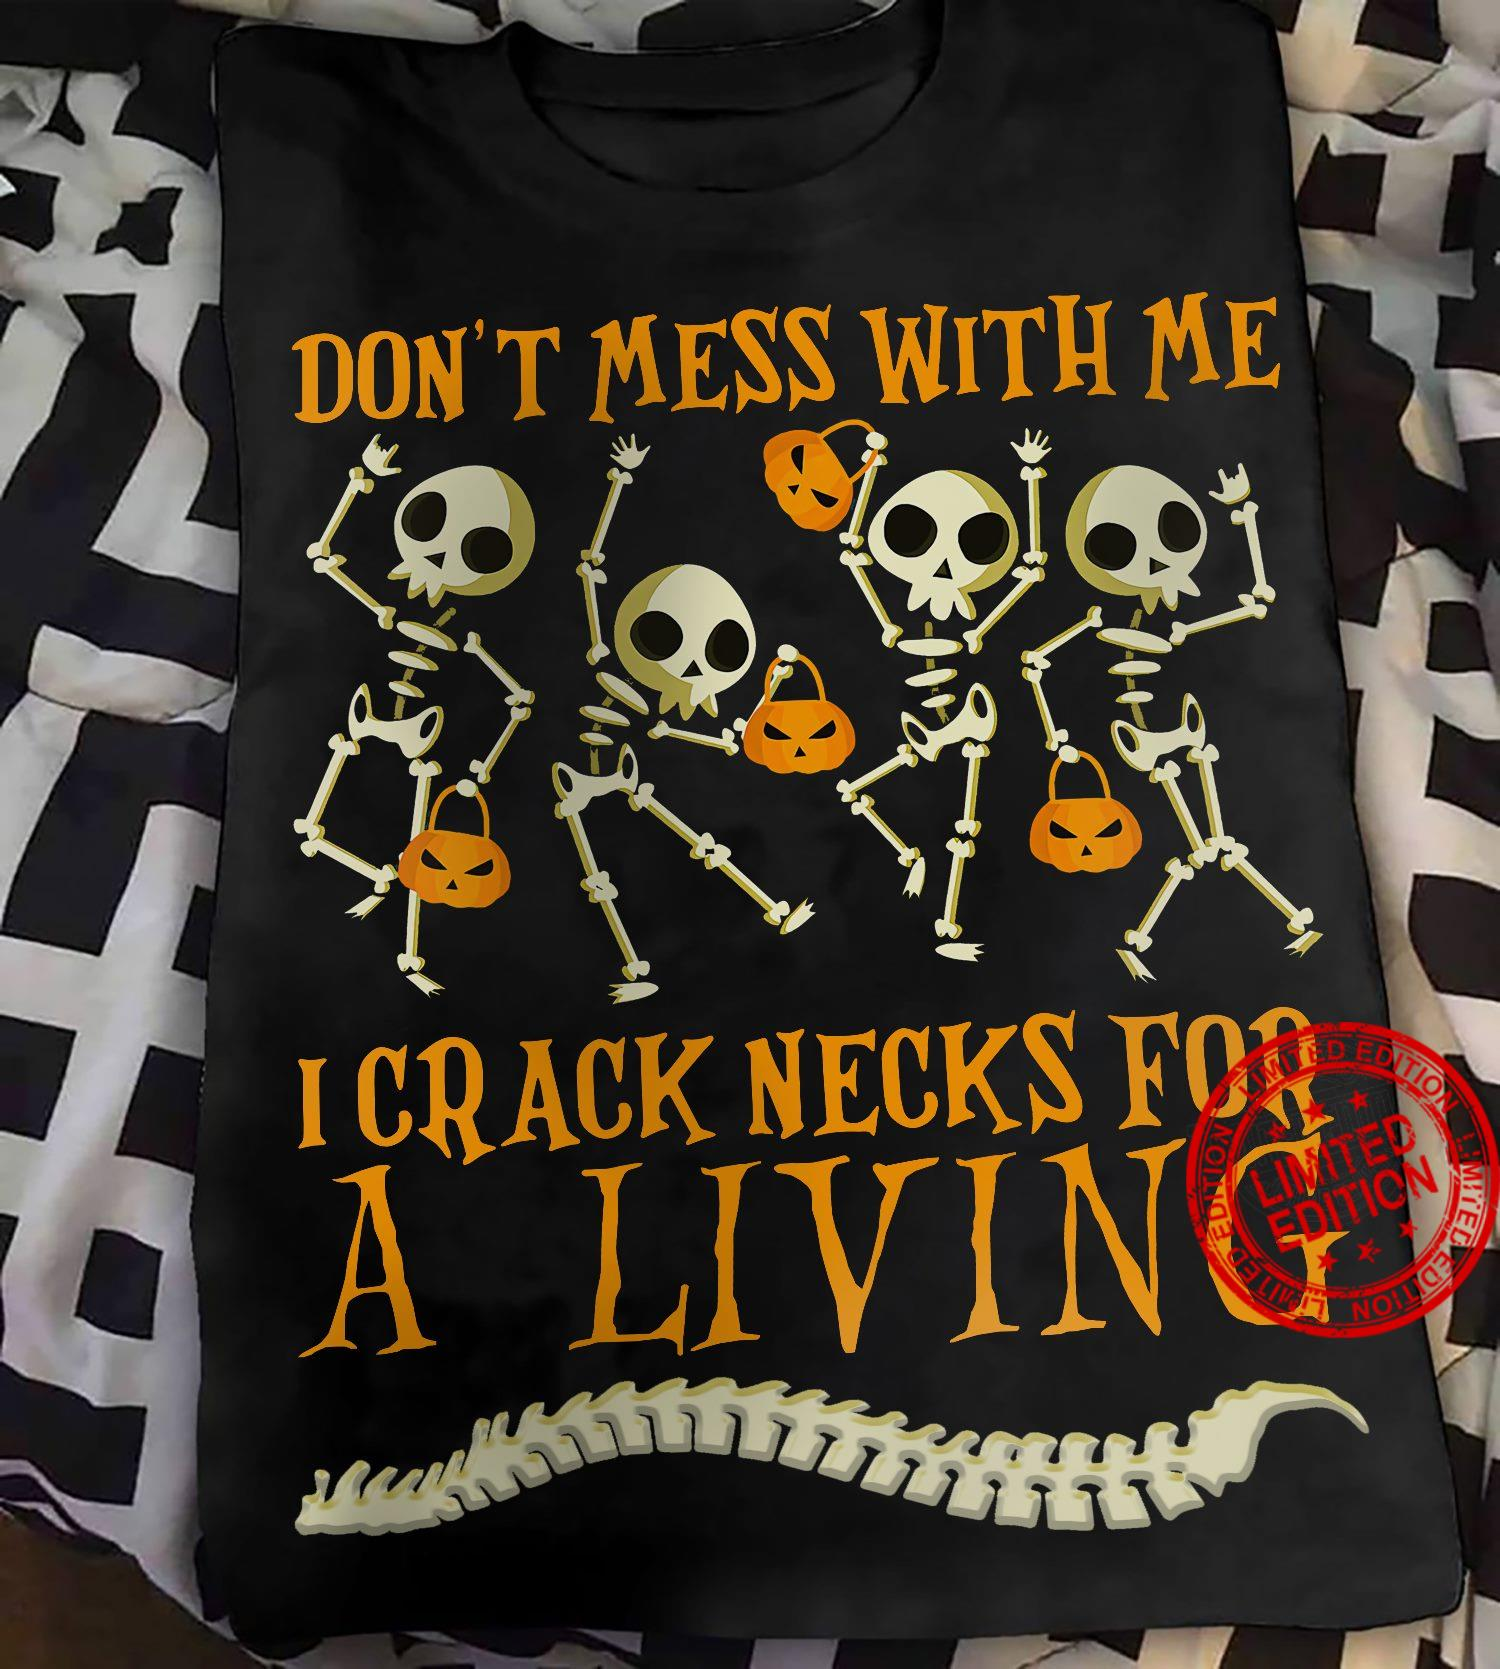 Don't Mess With Me I Crack Necks For A Living Shirt